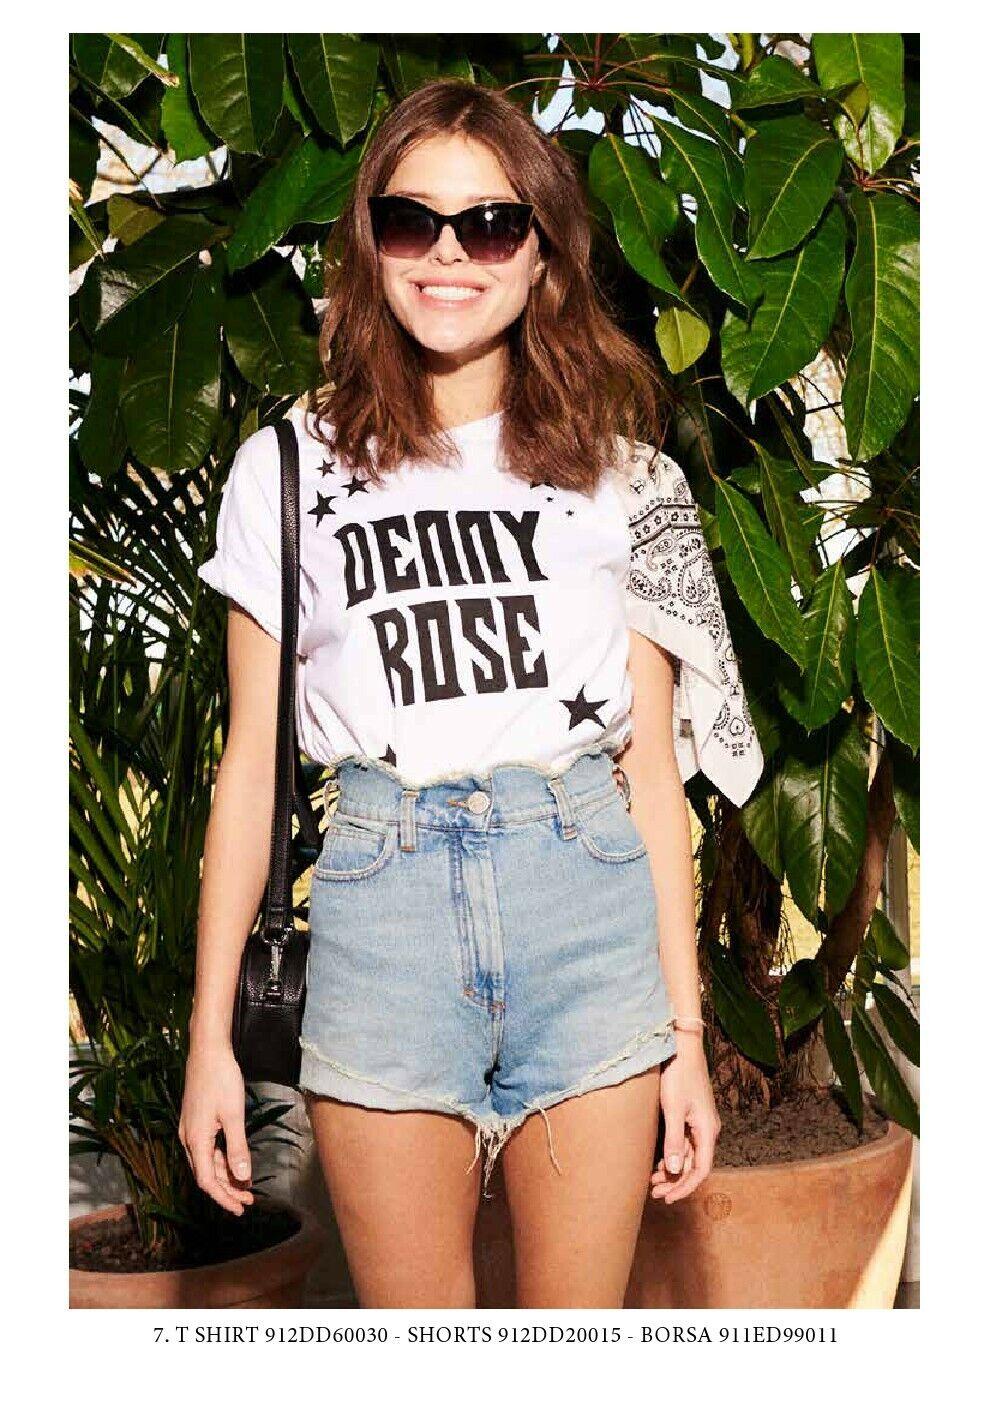 912DD60030 Denny Rosa t-shirt maglia Summer Estate 2019 pre-order